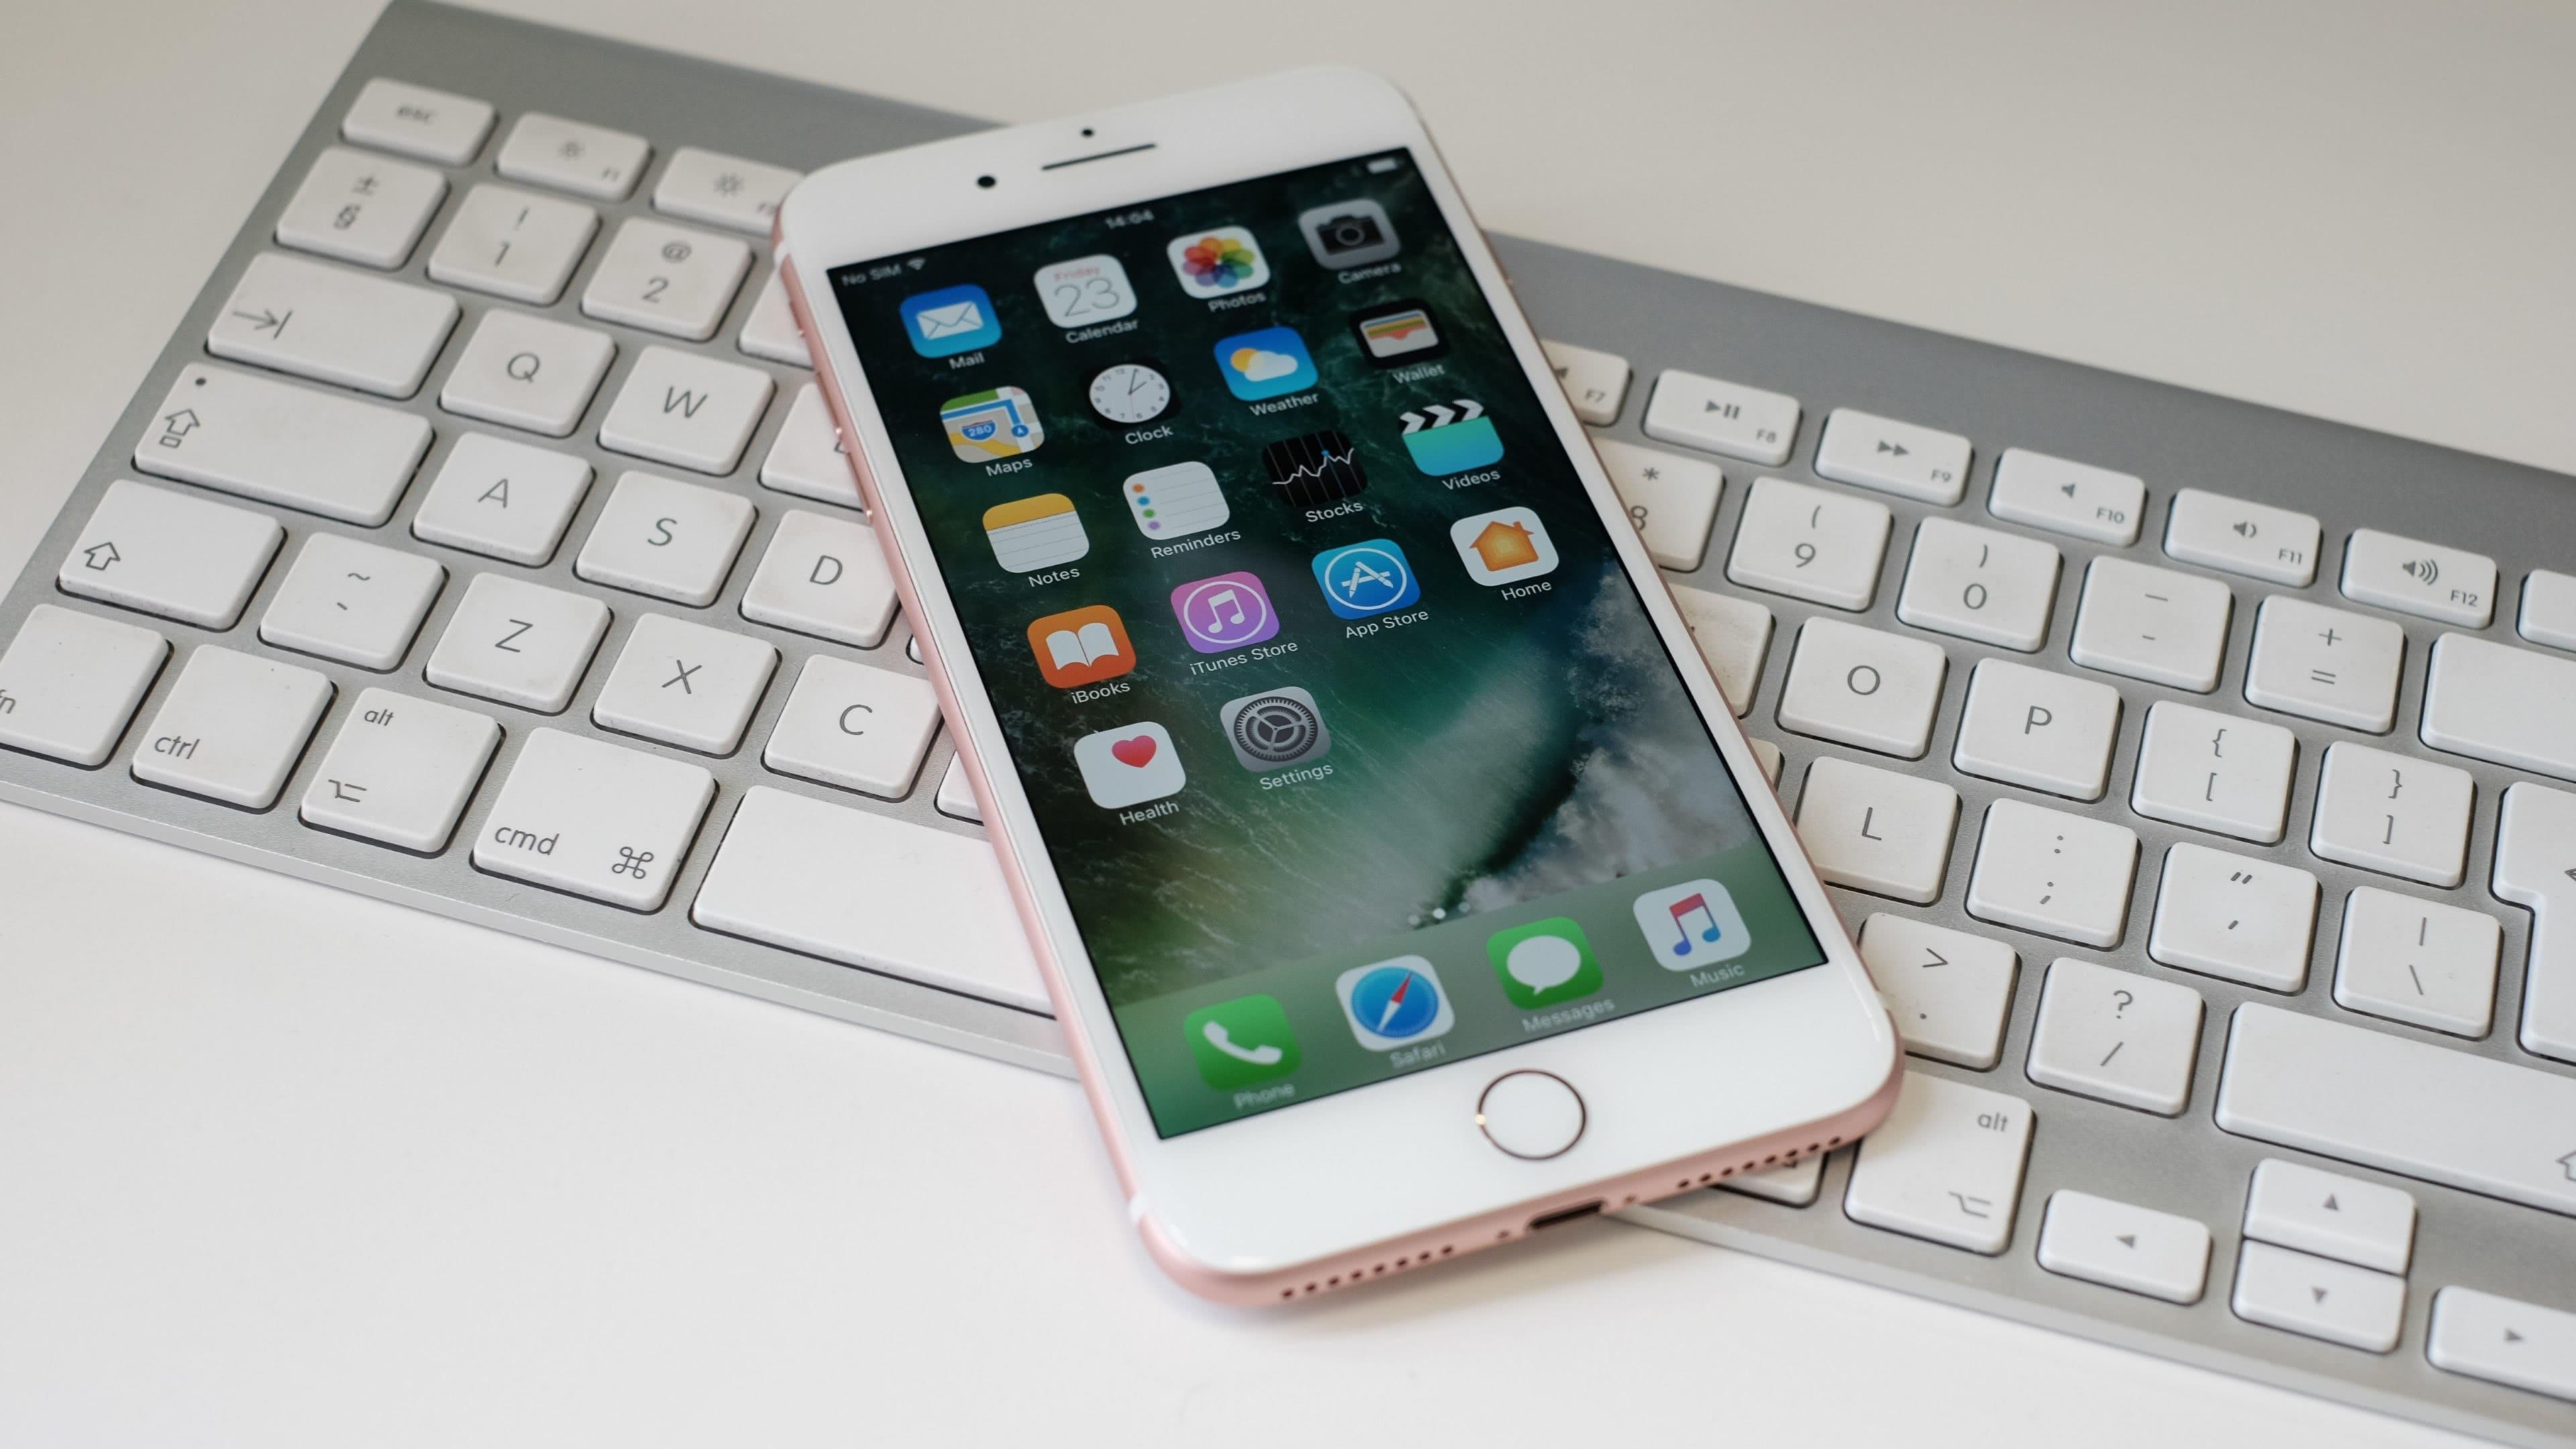 Iphone 7 Plus Uhd 4k Wallpaper - Iphone 7 Iphone Wallpapers 4k , HD Wallpaper & Backgrounds